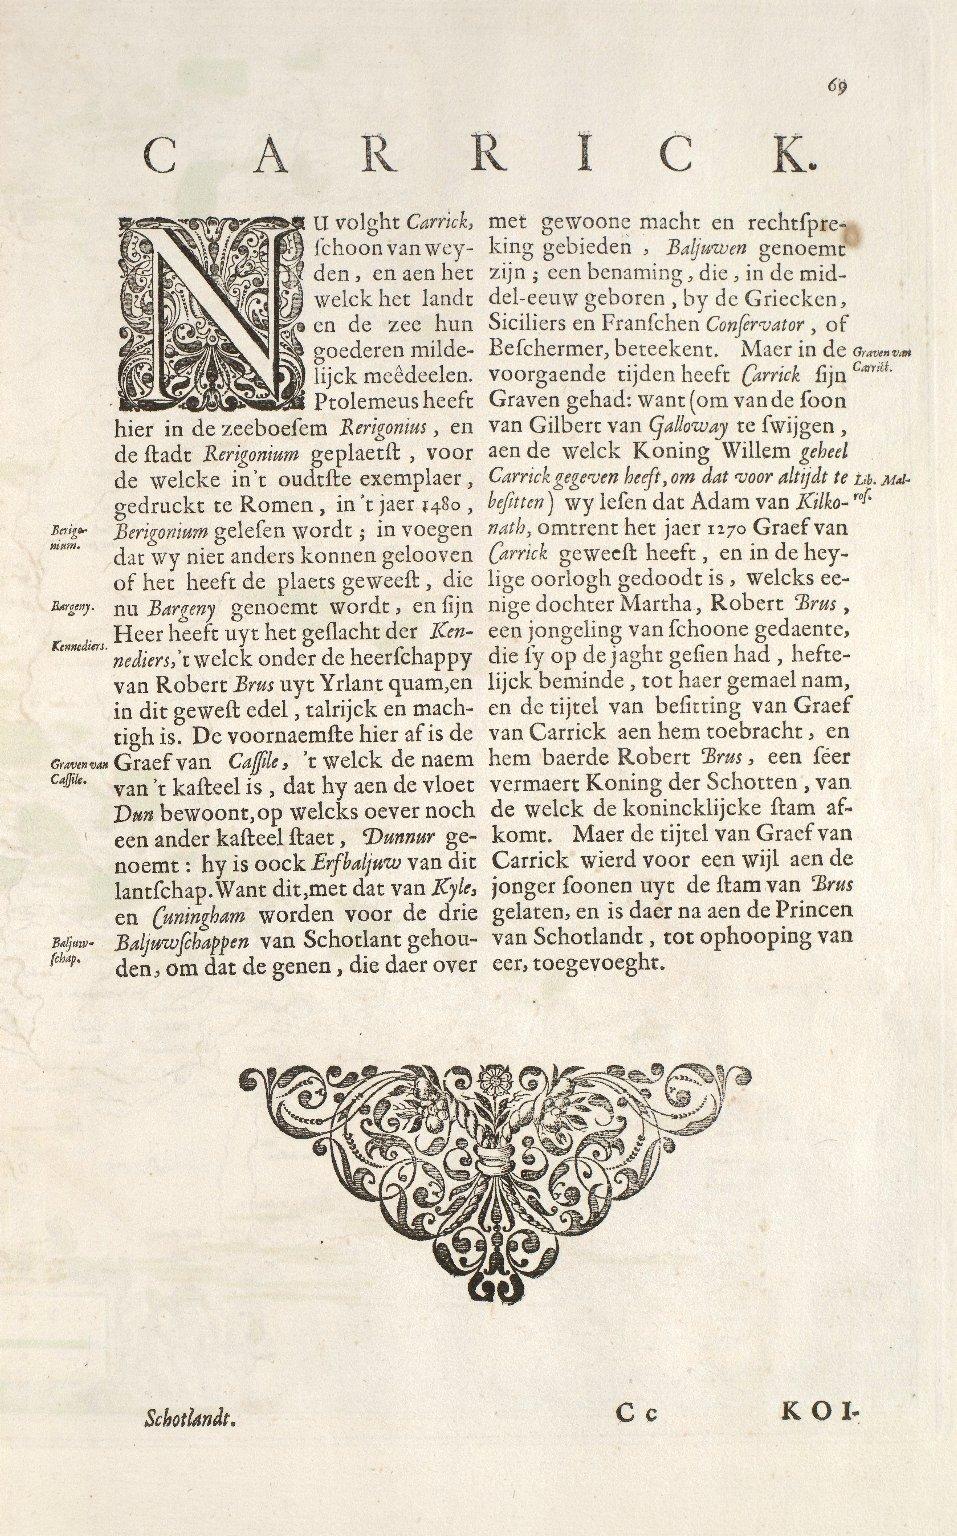 [Geographiae Blavianae] [Also known as: Atlas major] [058 of 153]